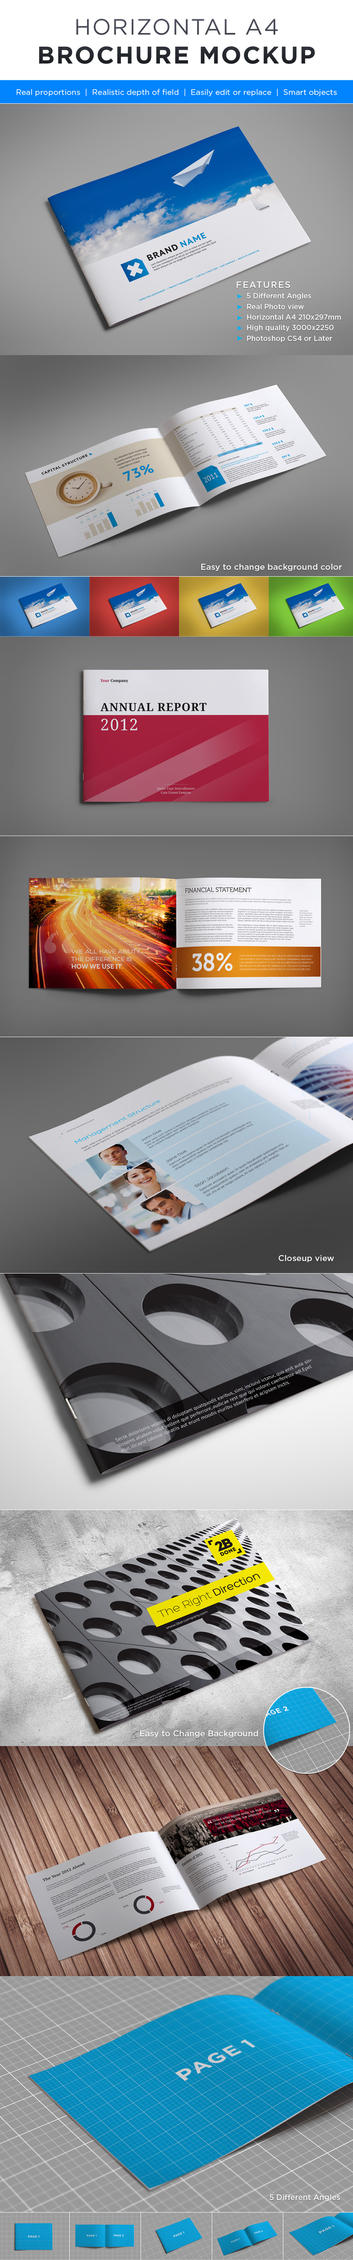 Horizontal brochure mock up by genetic96 on deviantart for Horizontal brochure design